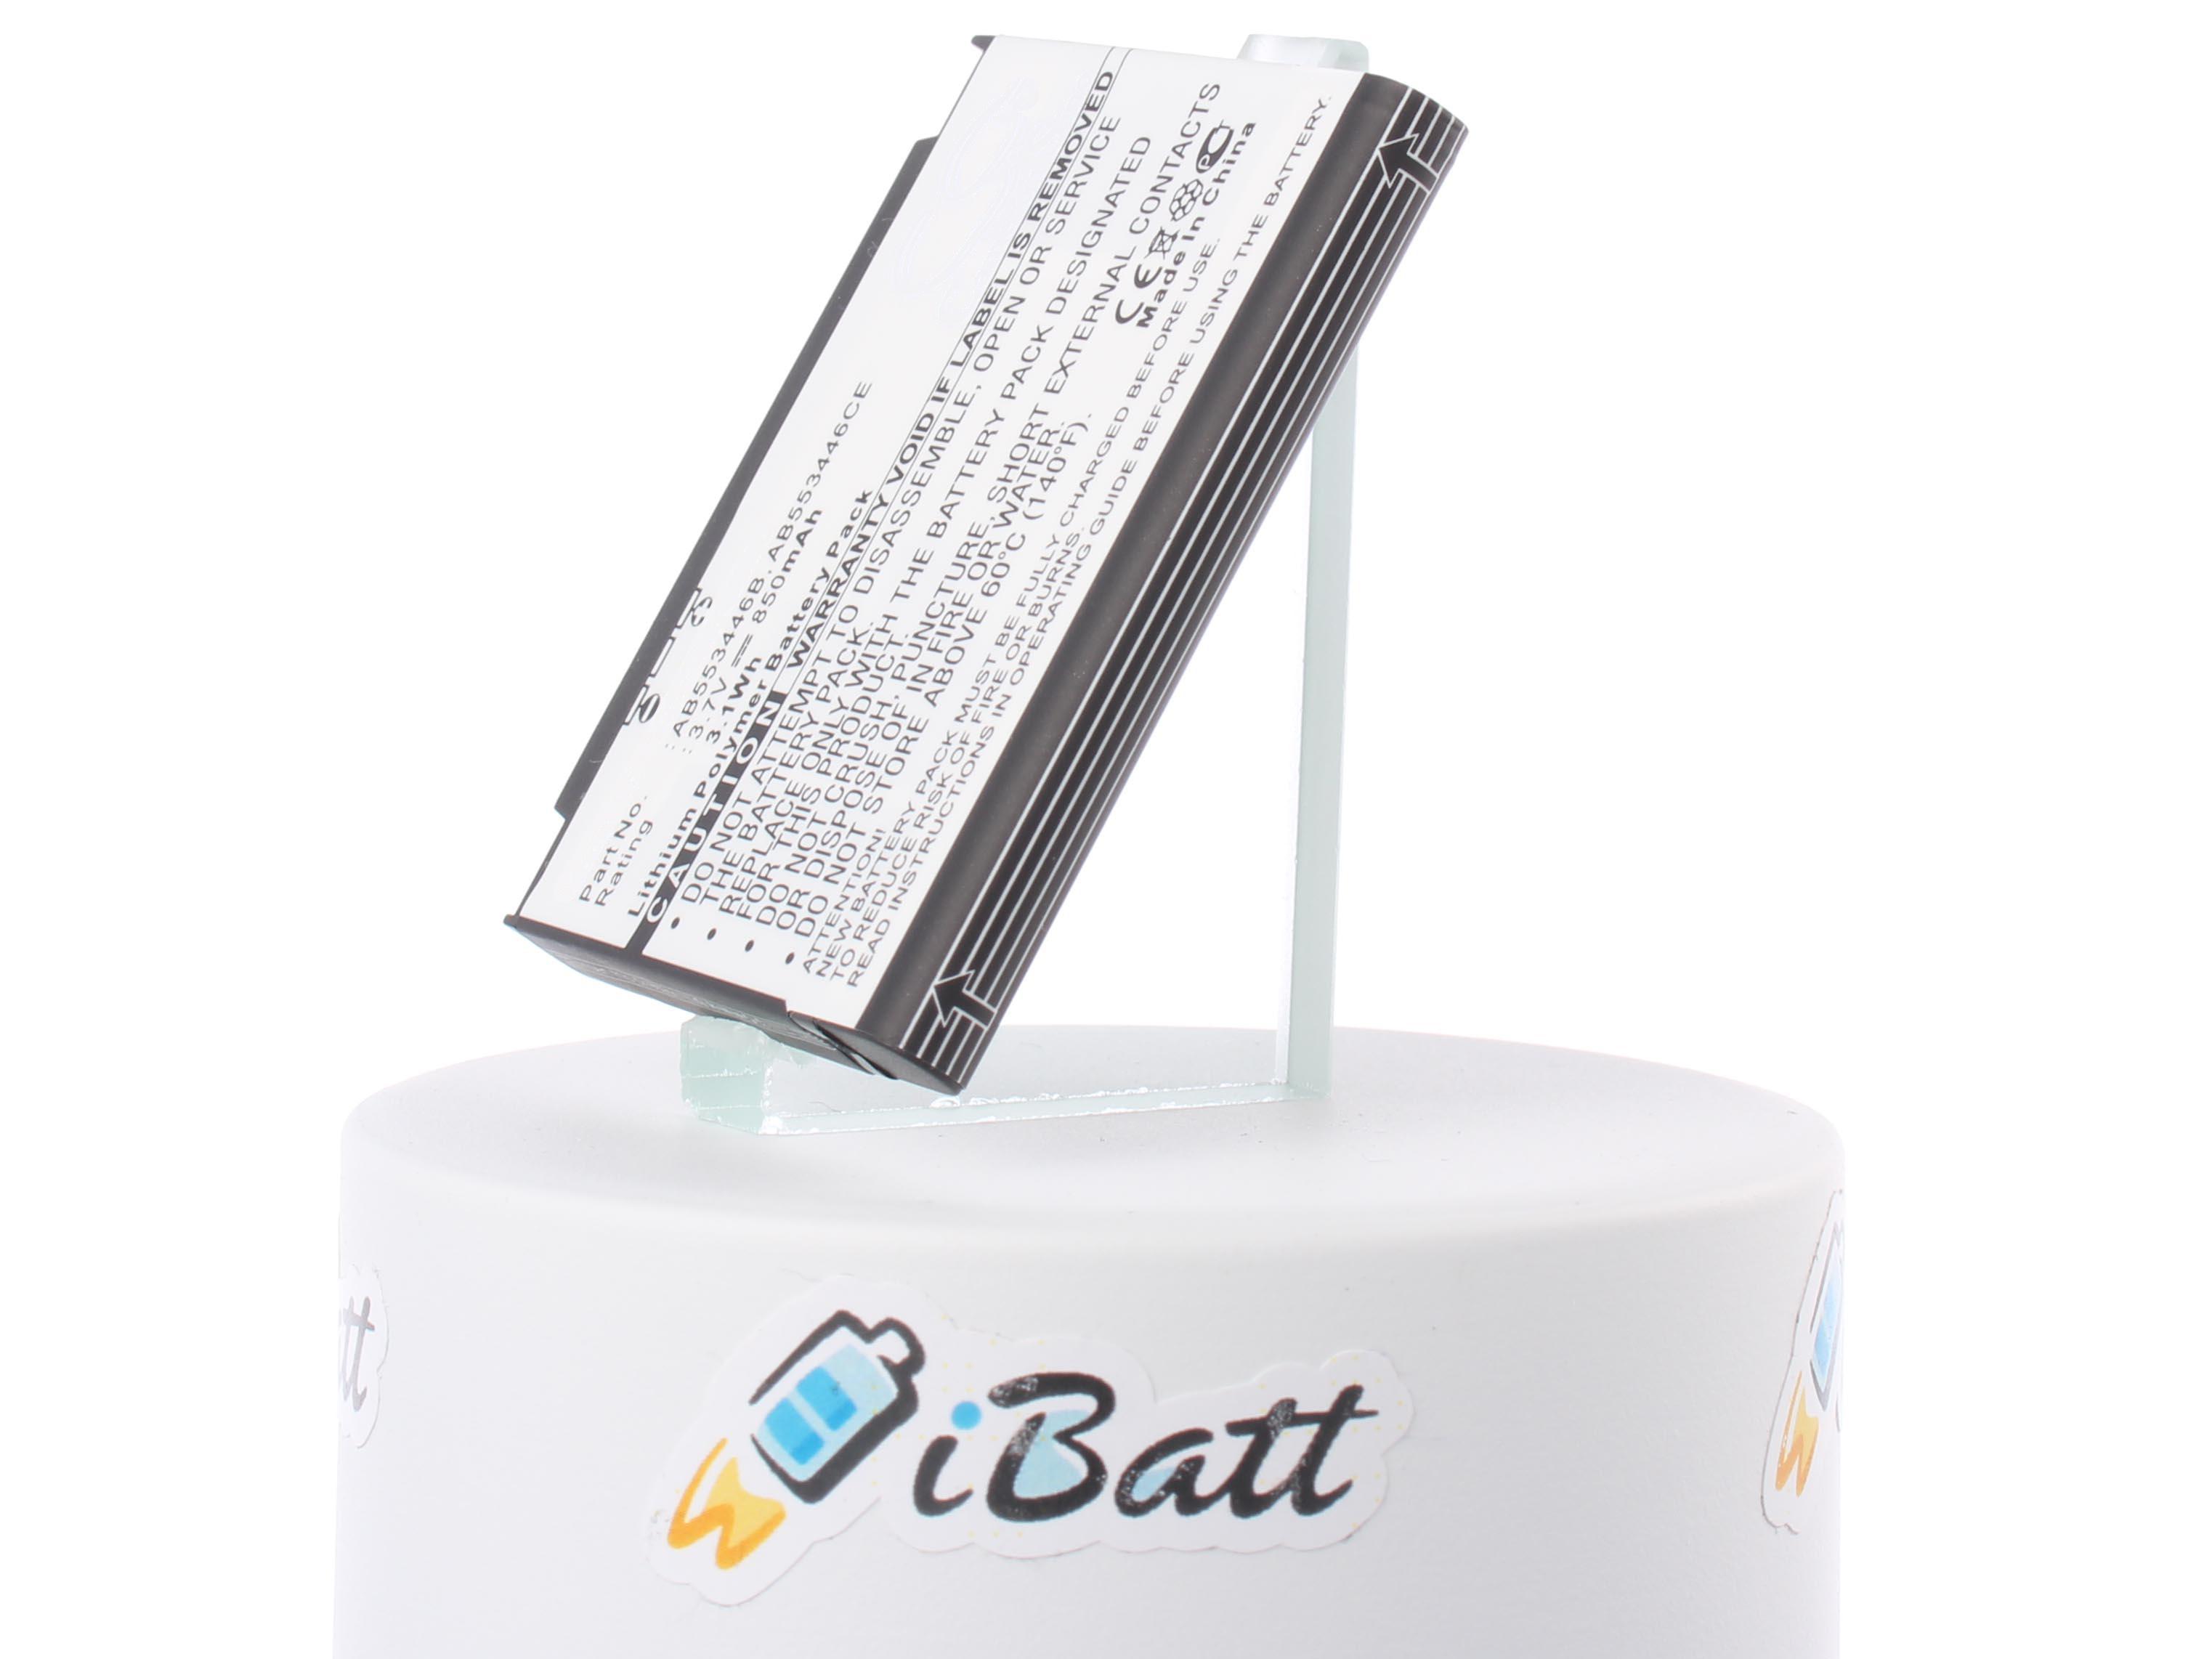 Аккумуляторная батарея для телефона, смартфона Samsung SGH-F480. Артикул iB-M276.Емкость (mAh): 850. Напряжение (V): 3,7